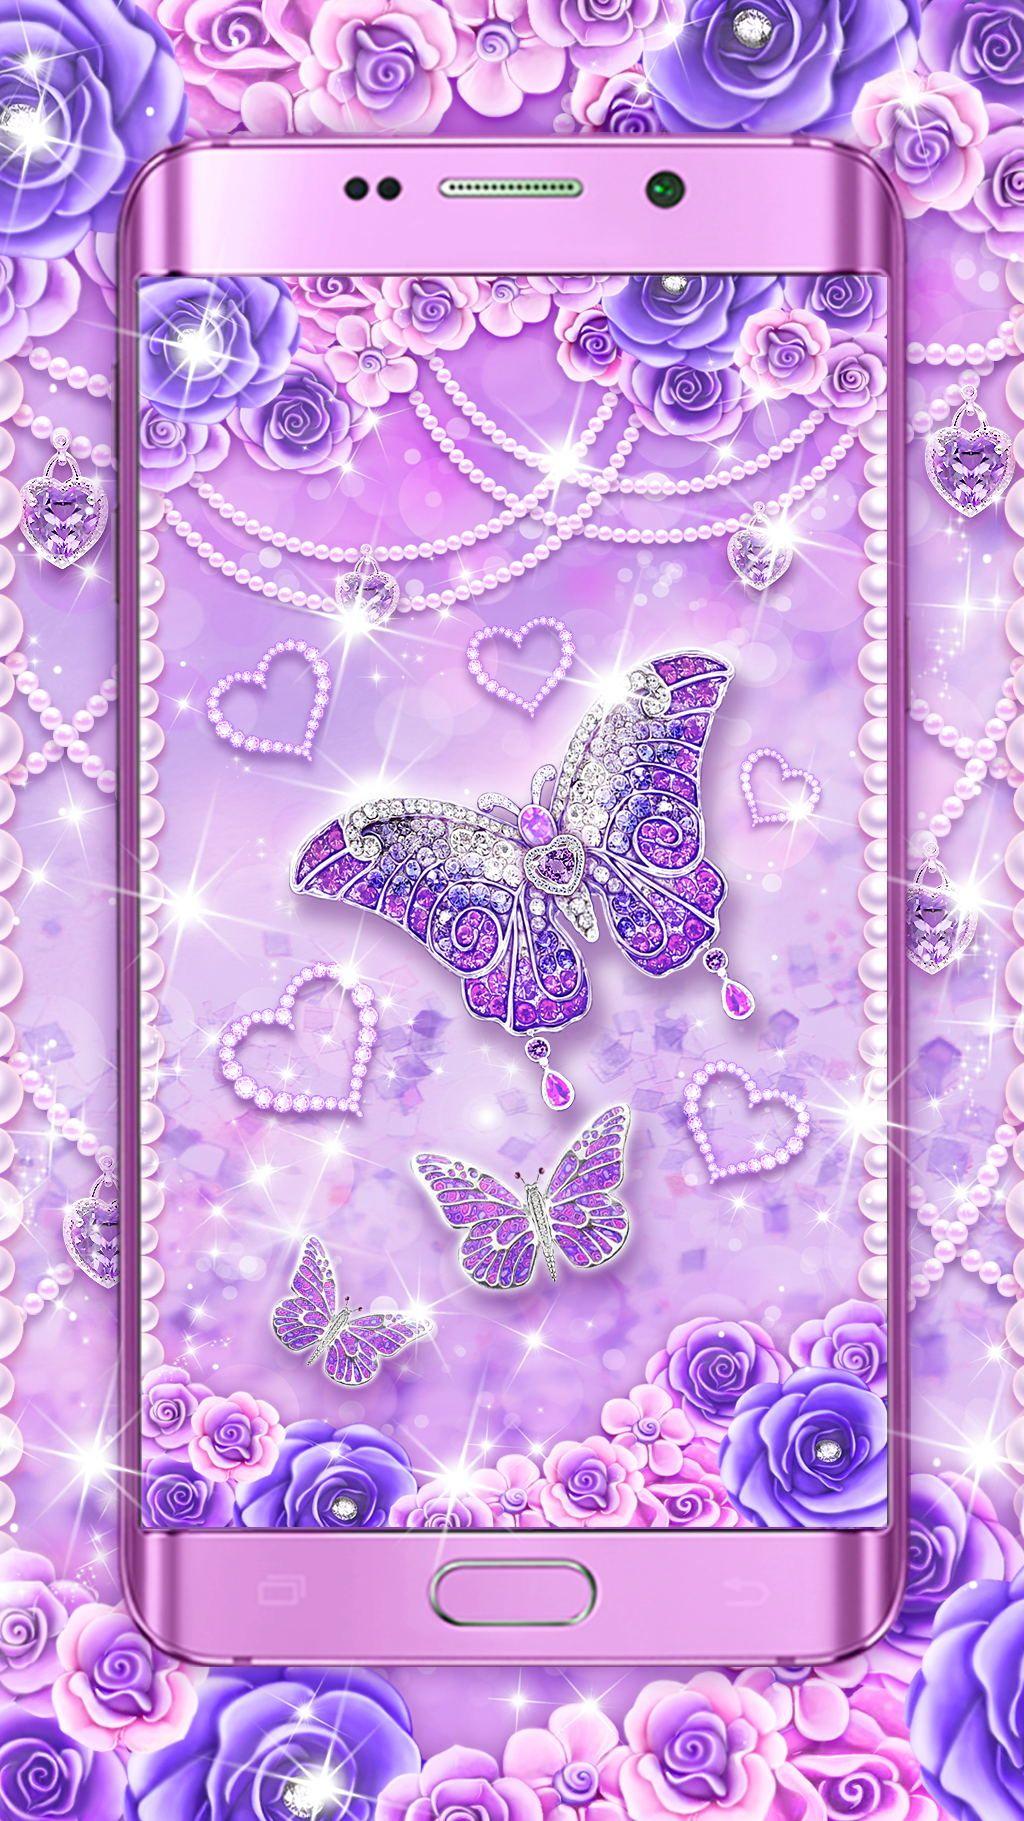 Purple diamond butterfly live wallpaper! Live wallpapers